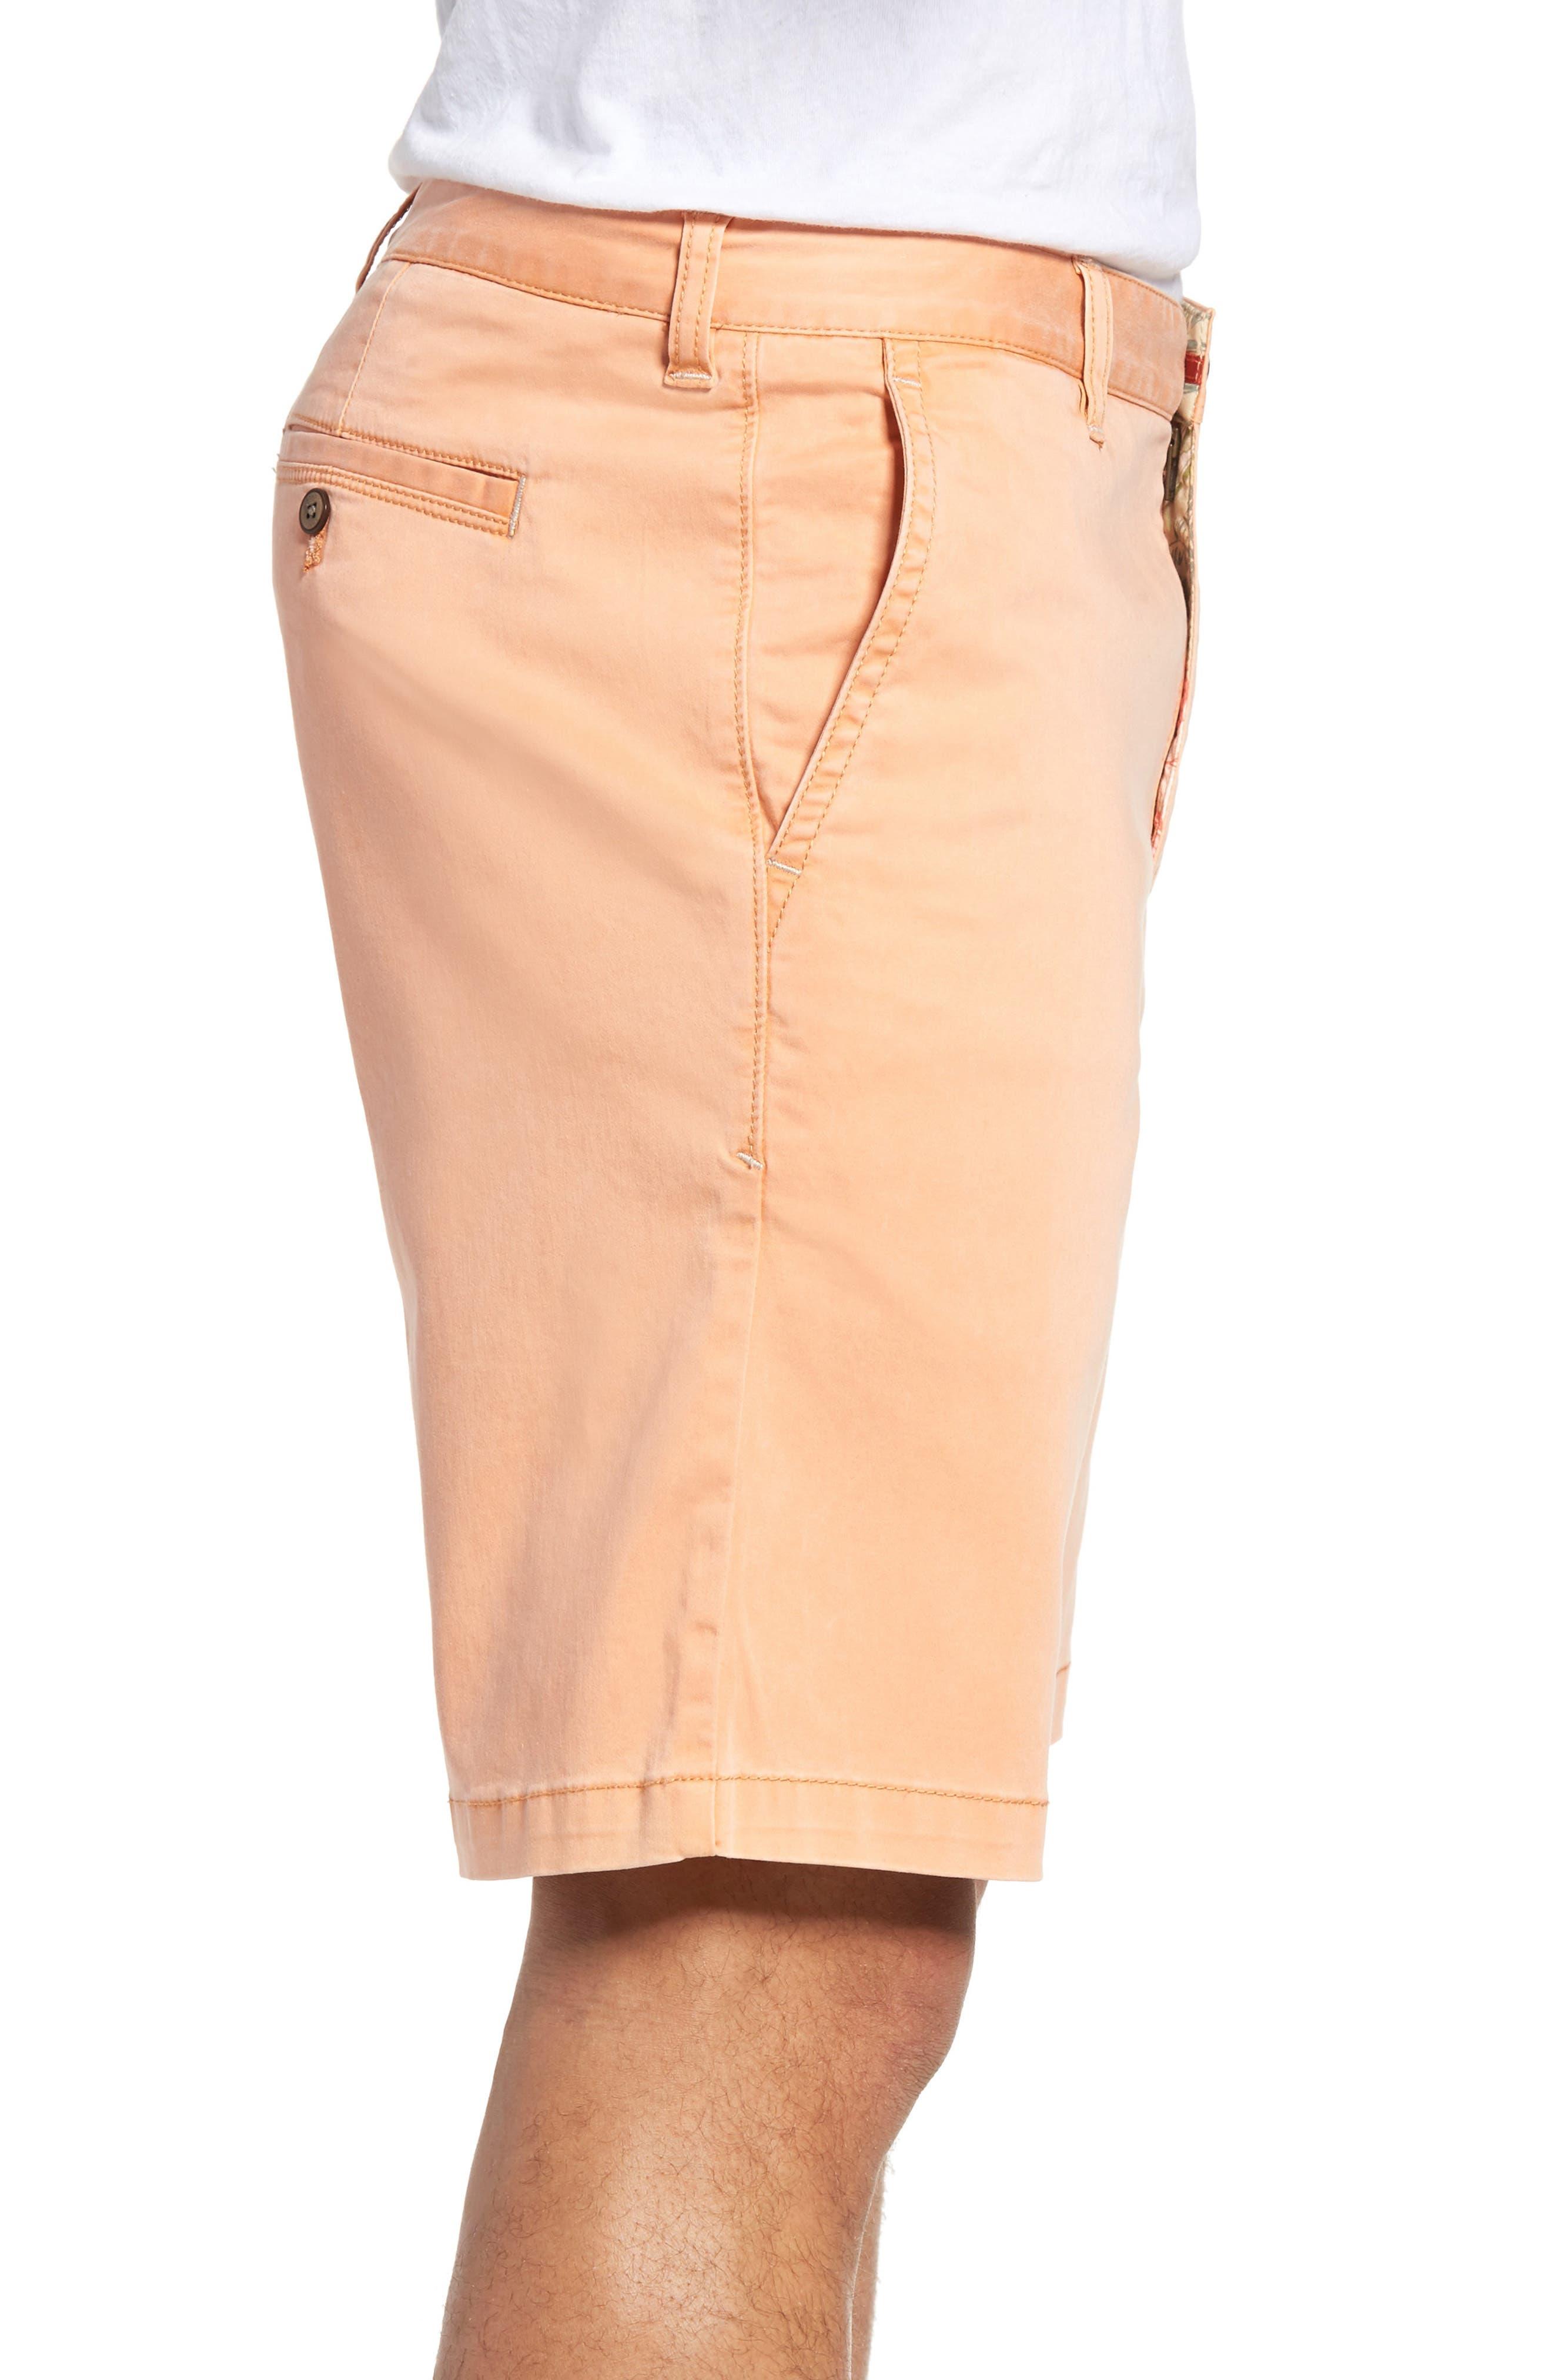 Boracay Chino Shorts,                             Alternate thumbnail 26, color,